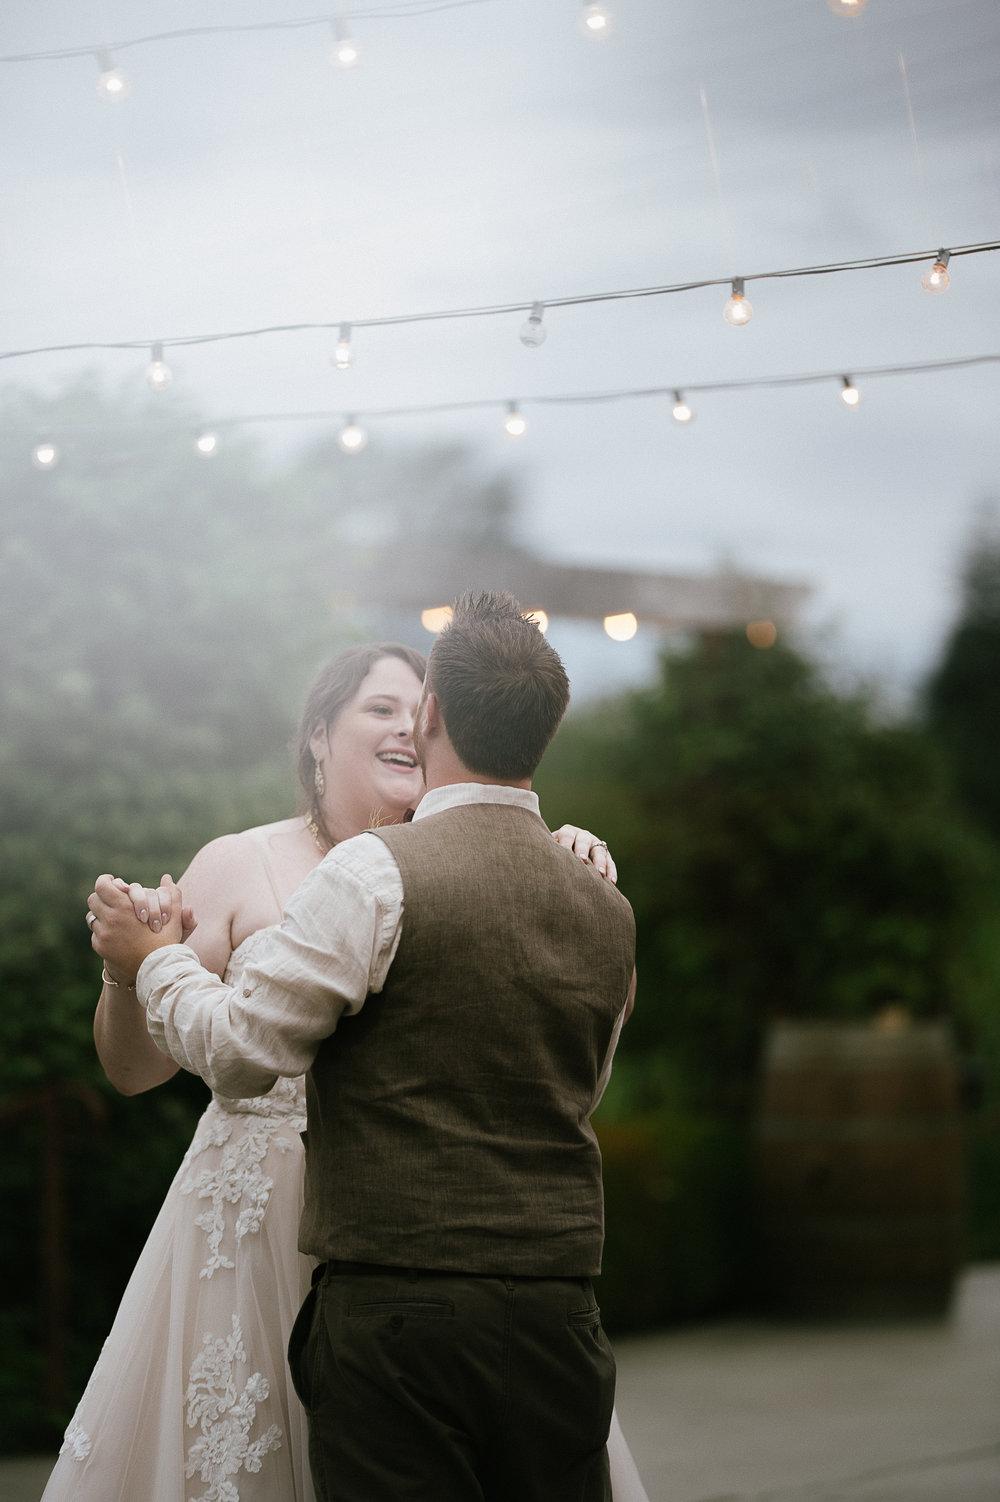 Swan Trail Farm Wedding_Sarah Schurman + Brian Skadan_Snohomish Wedding_Kelsey Lane Photography-6296.jpg